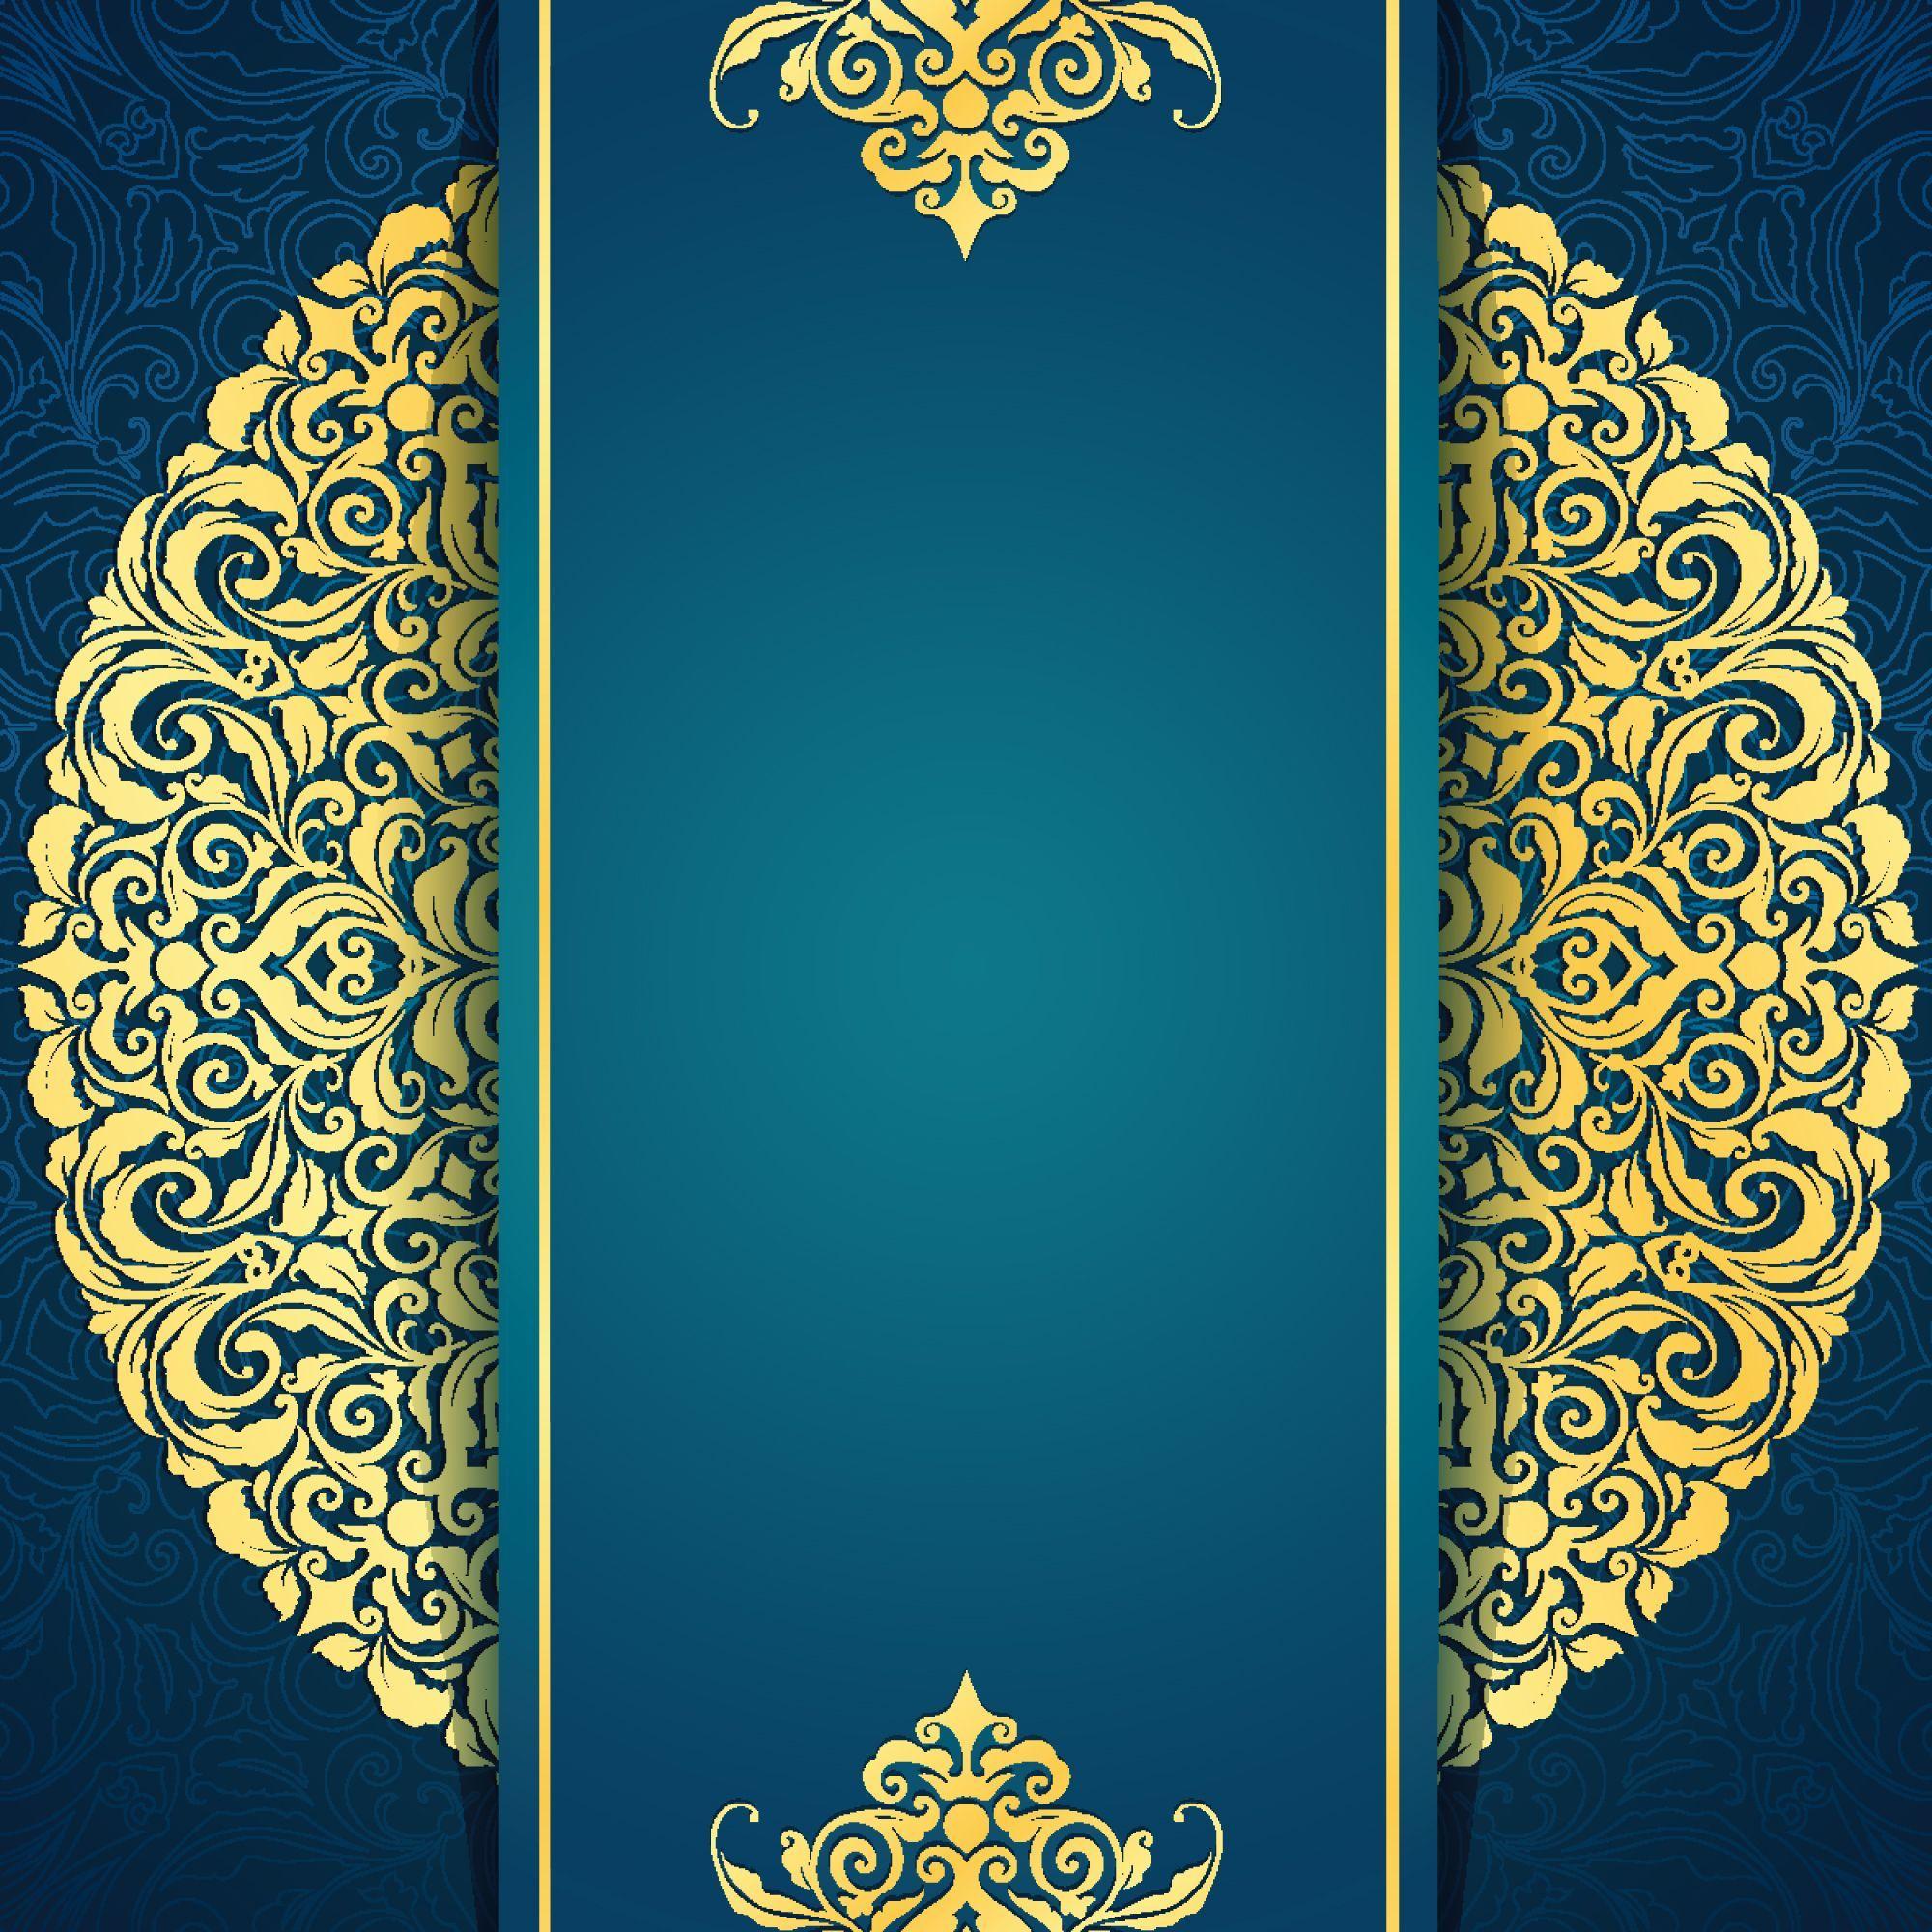 Royal Blue Hd Background For Wedding Invitation